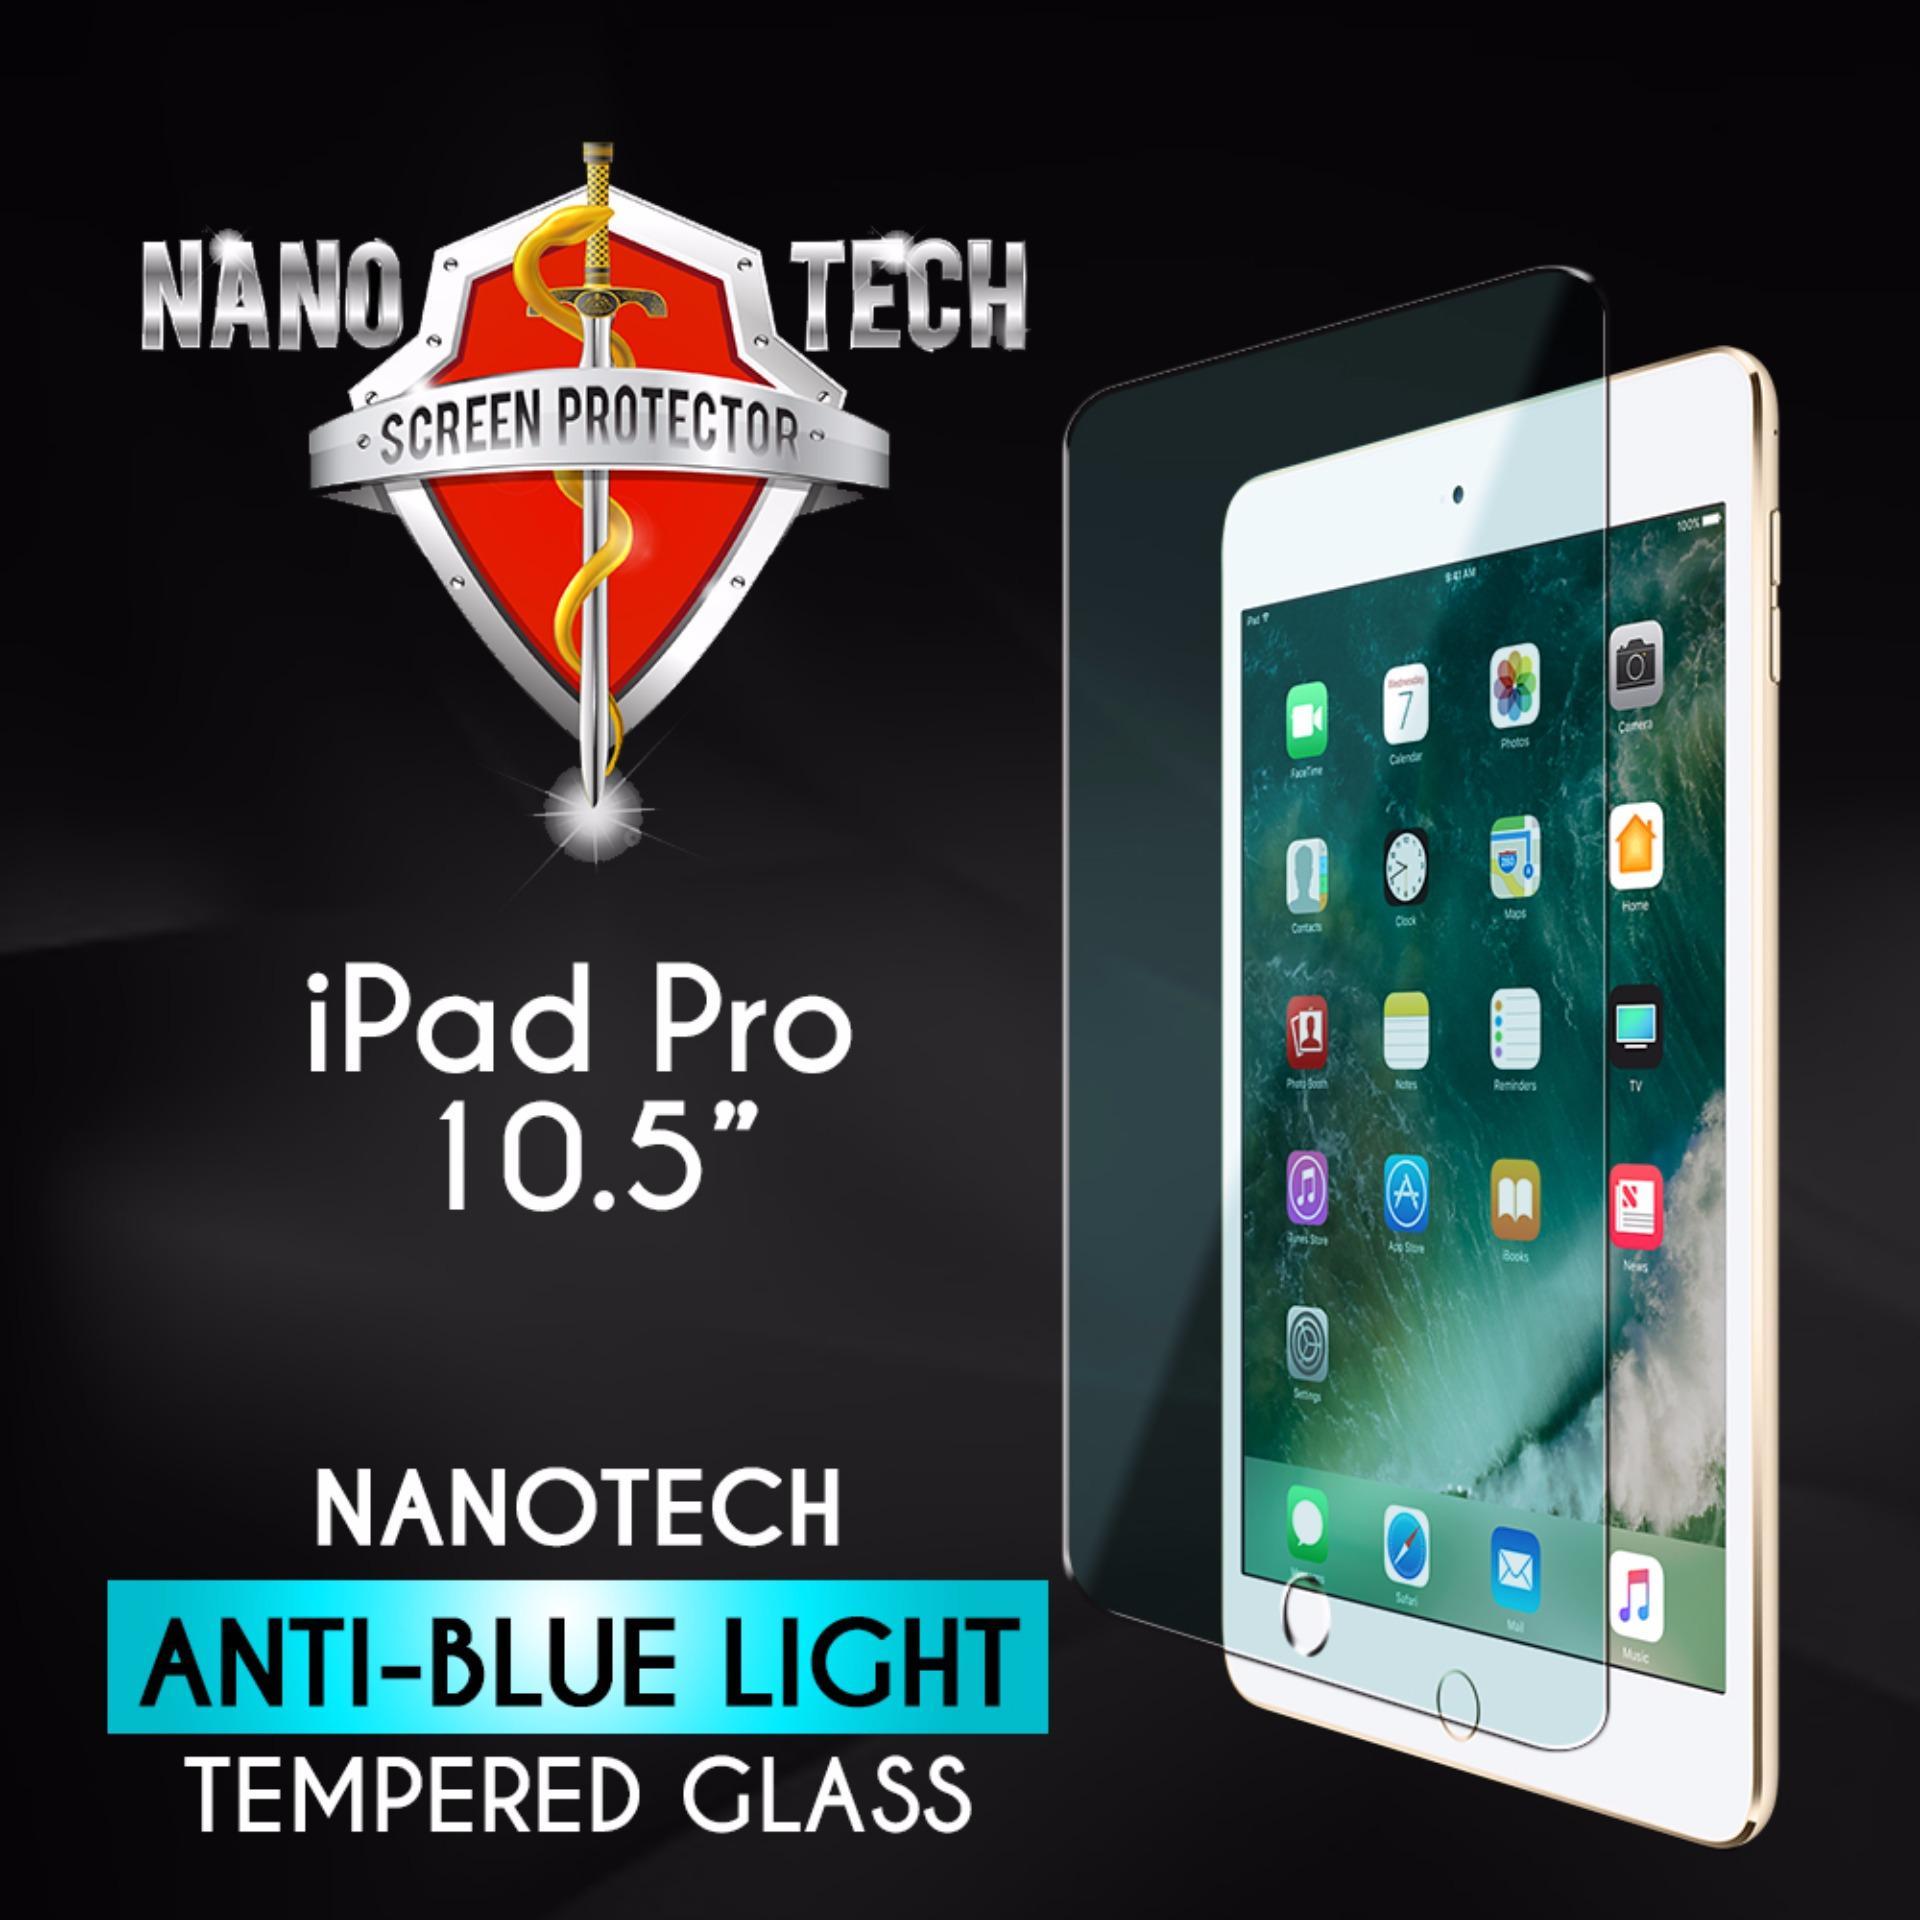 Nanotech iPad Pro 10.5″ Tempered Glass Screen Protector [Anti-blue light]